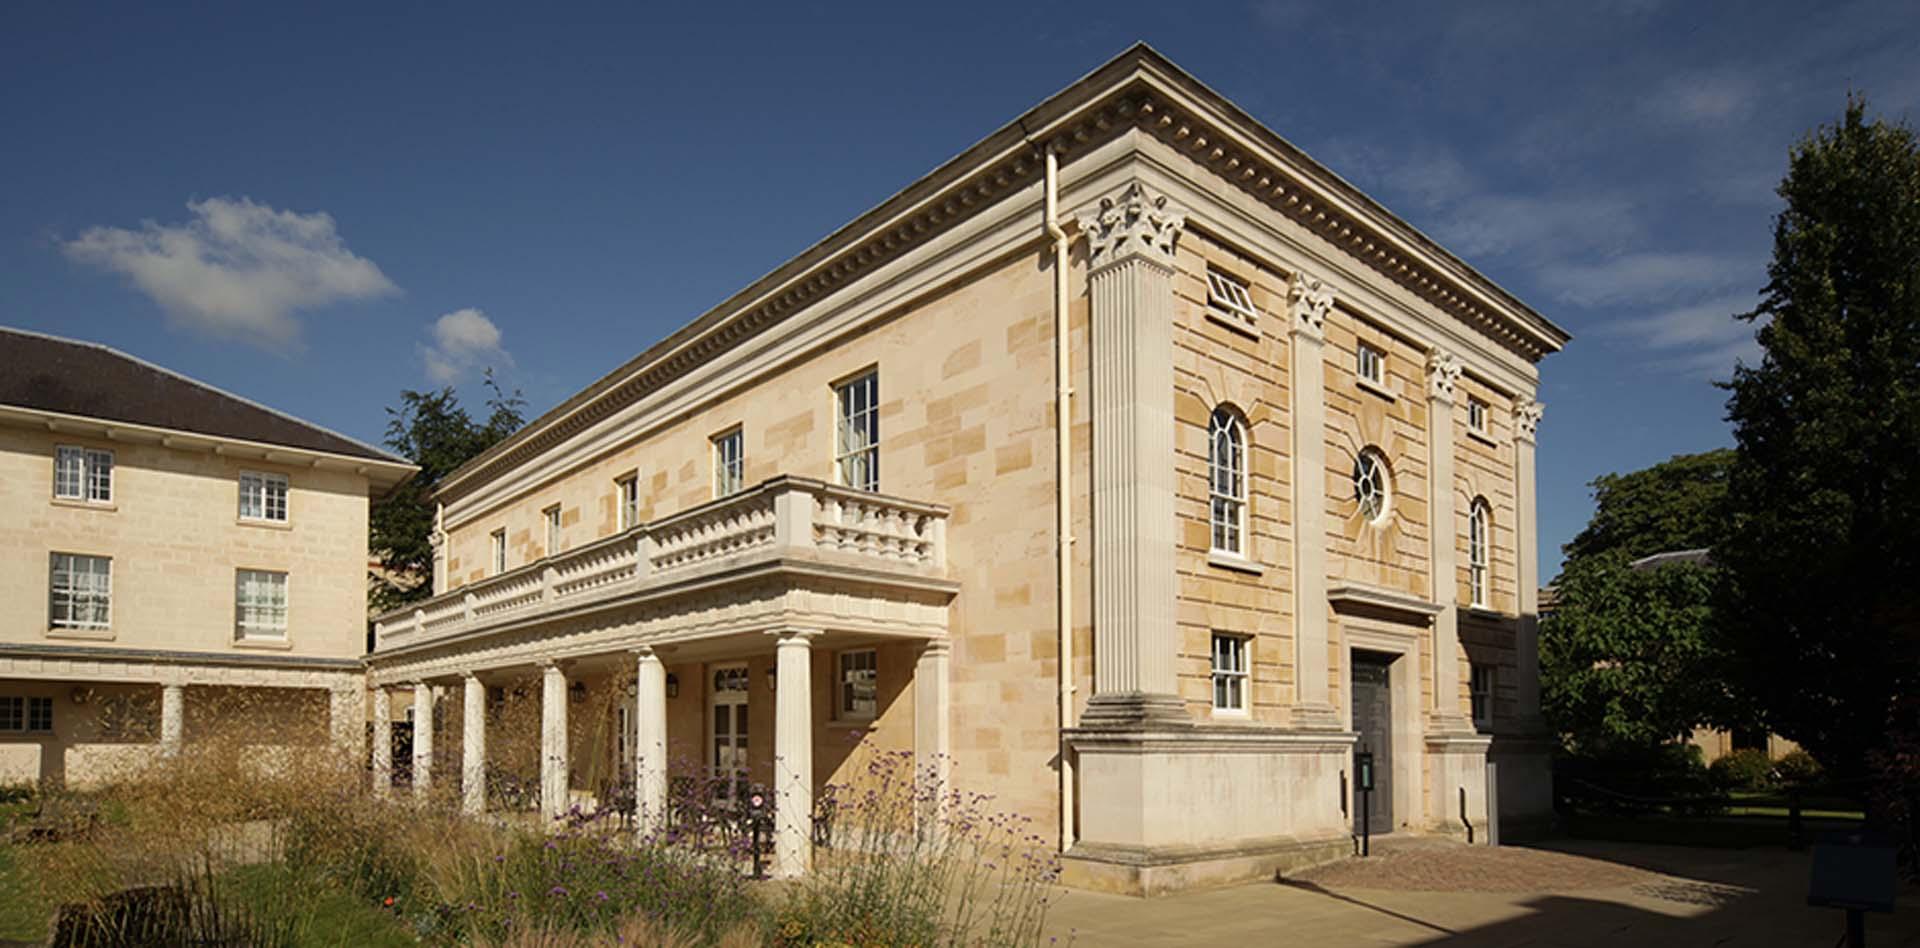 The Howard Building, Cambridge